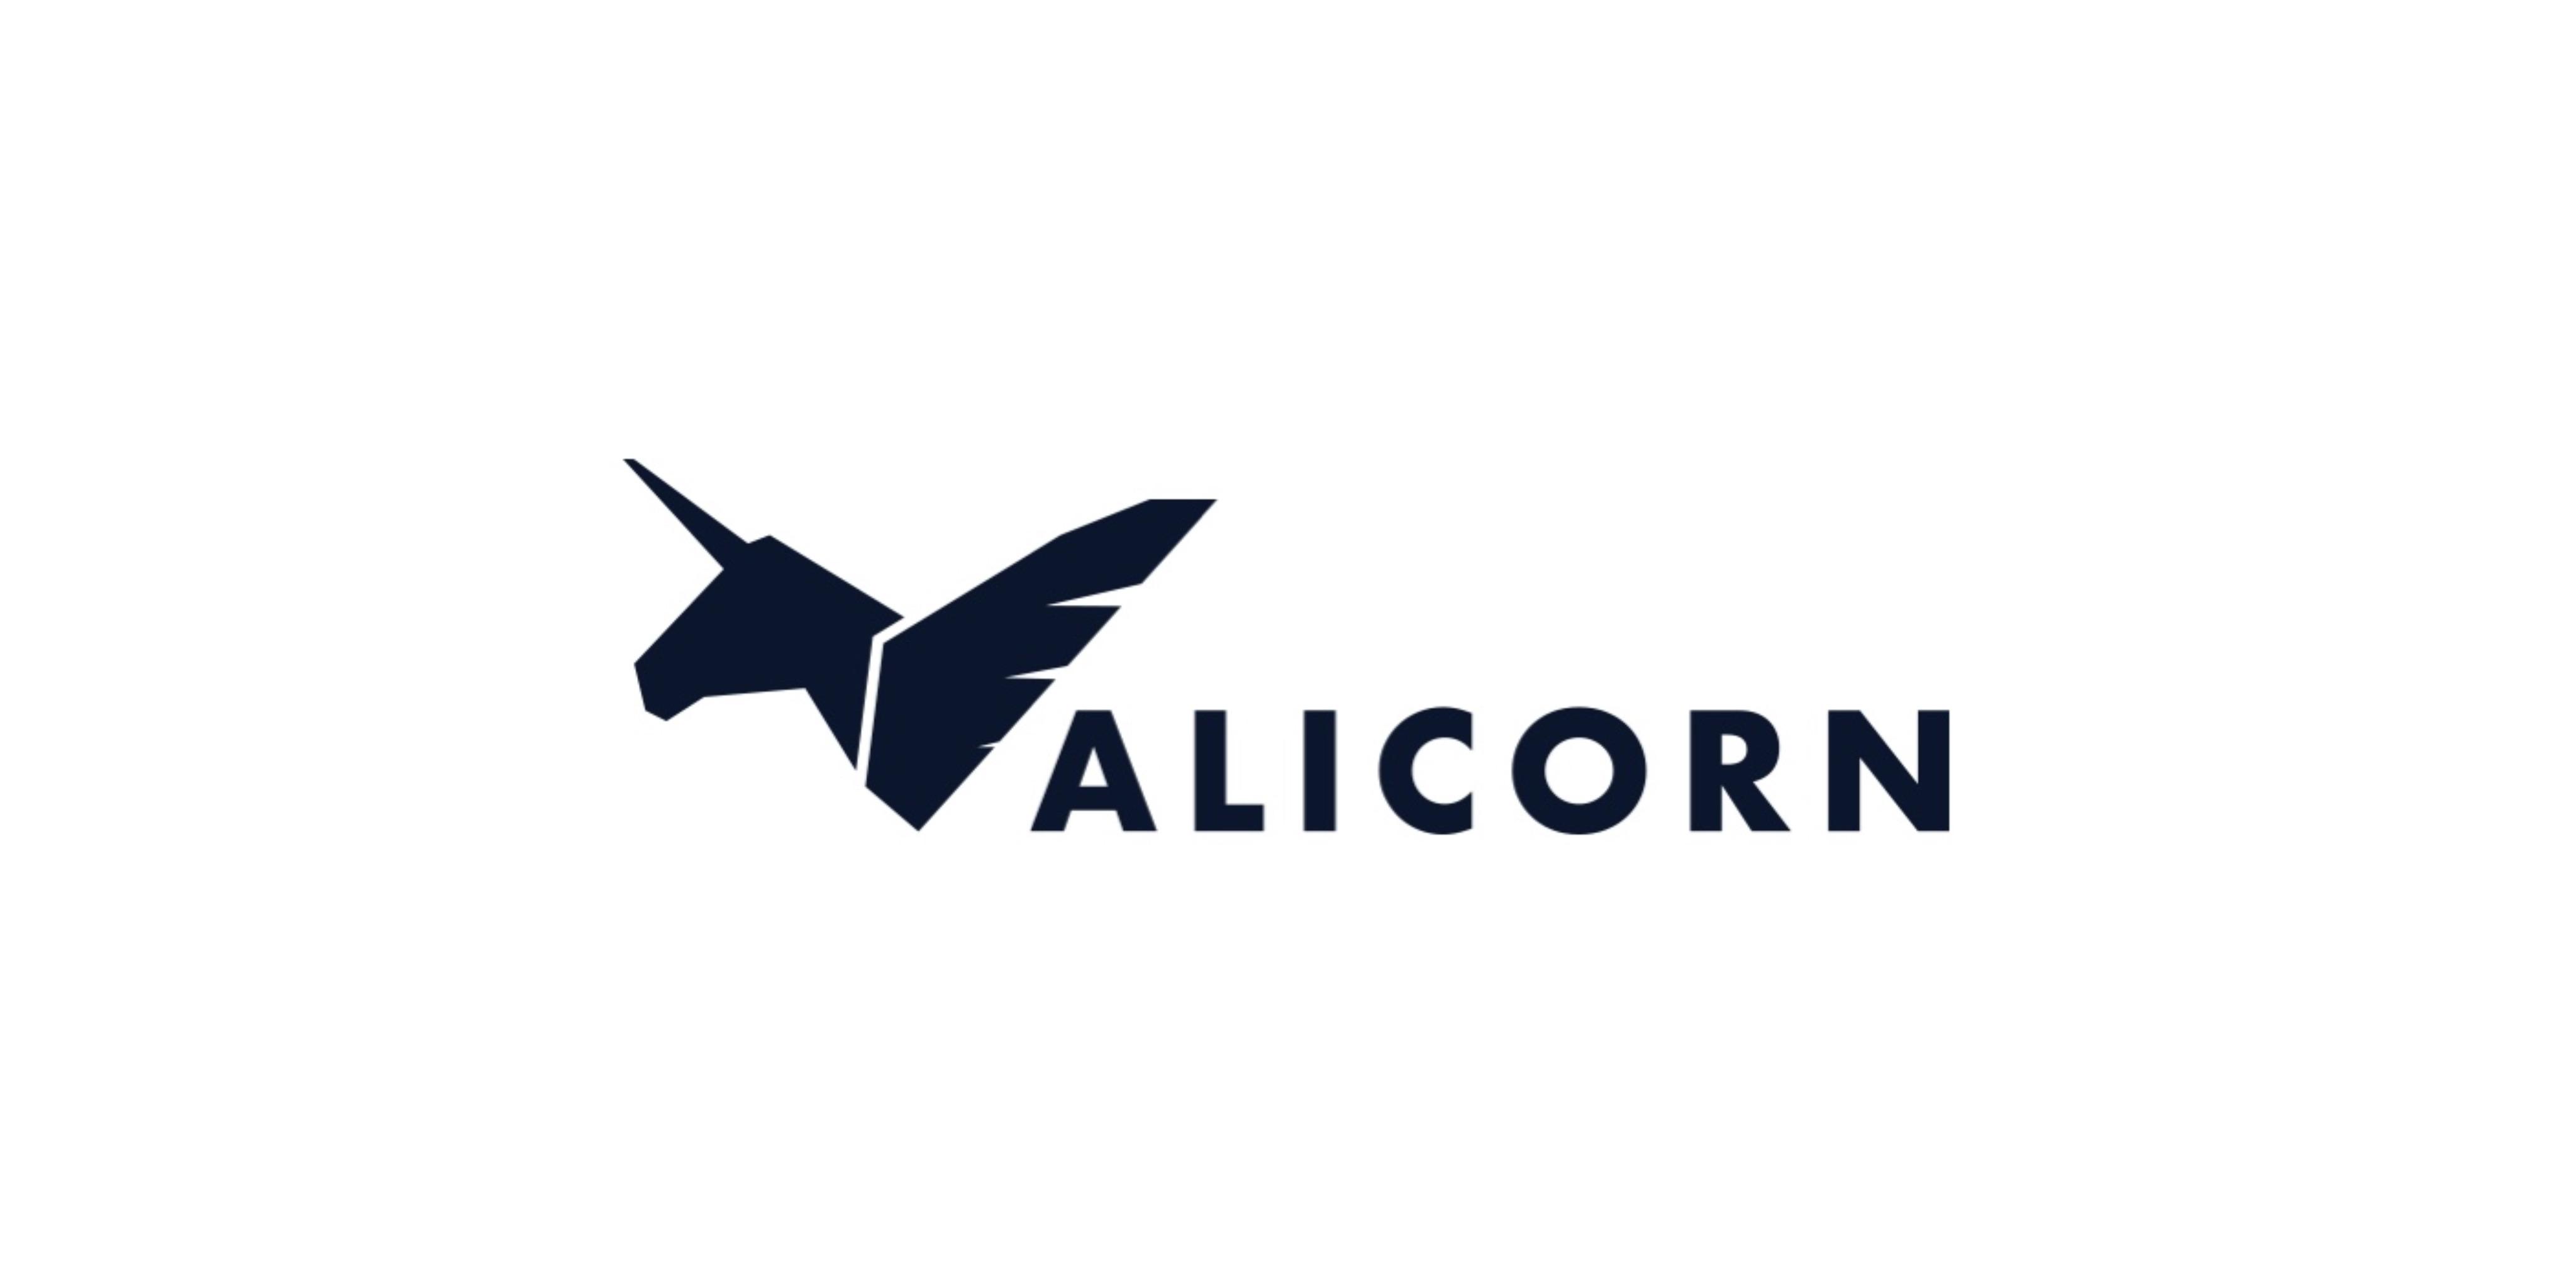 Alicorn Backed Glassbox Lists on Tel Aviv Stock Exchange at Pre-Money Valuation of US$350m